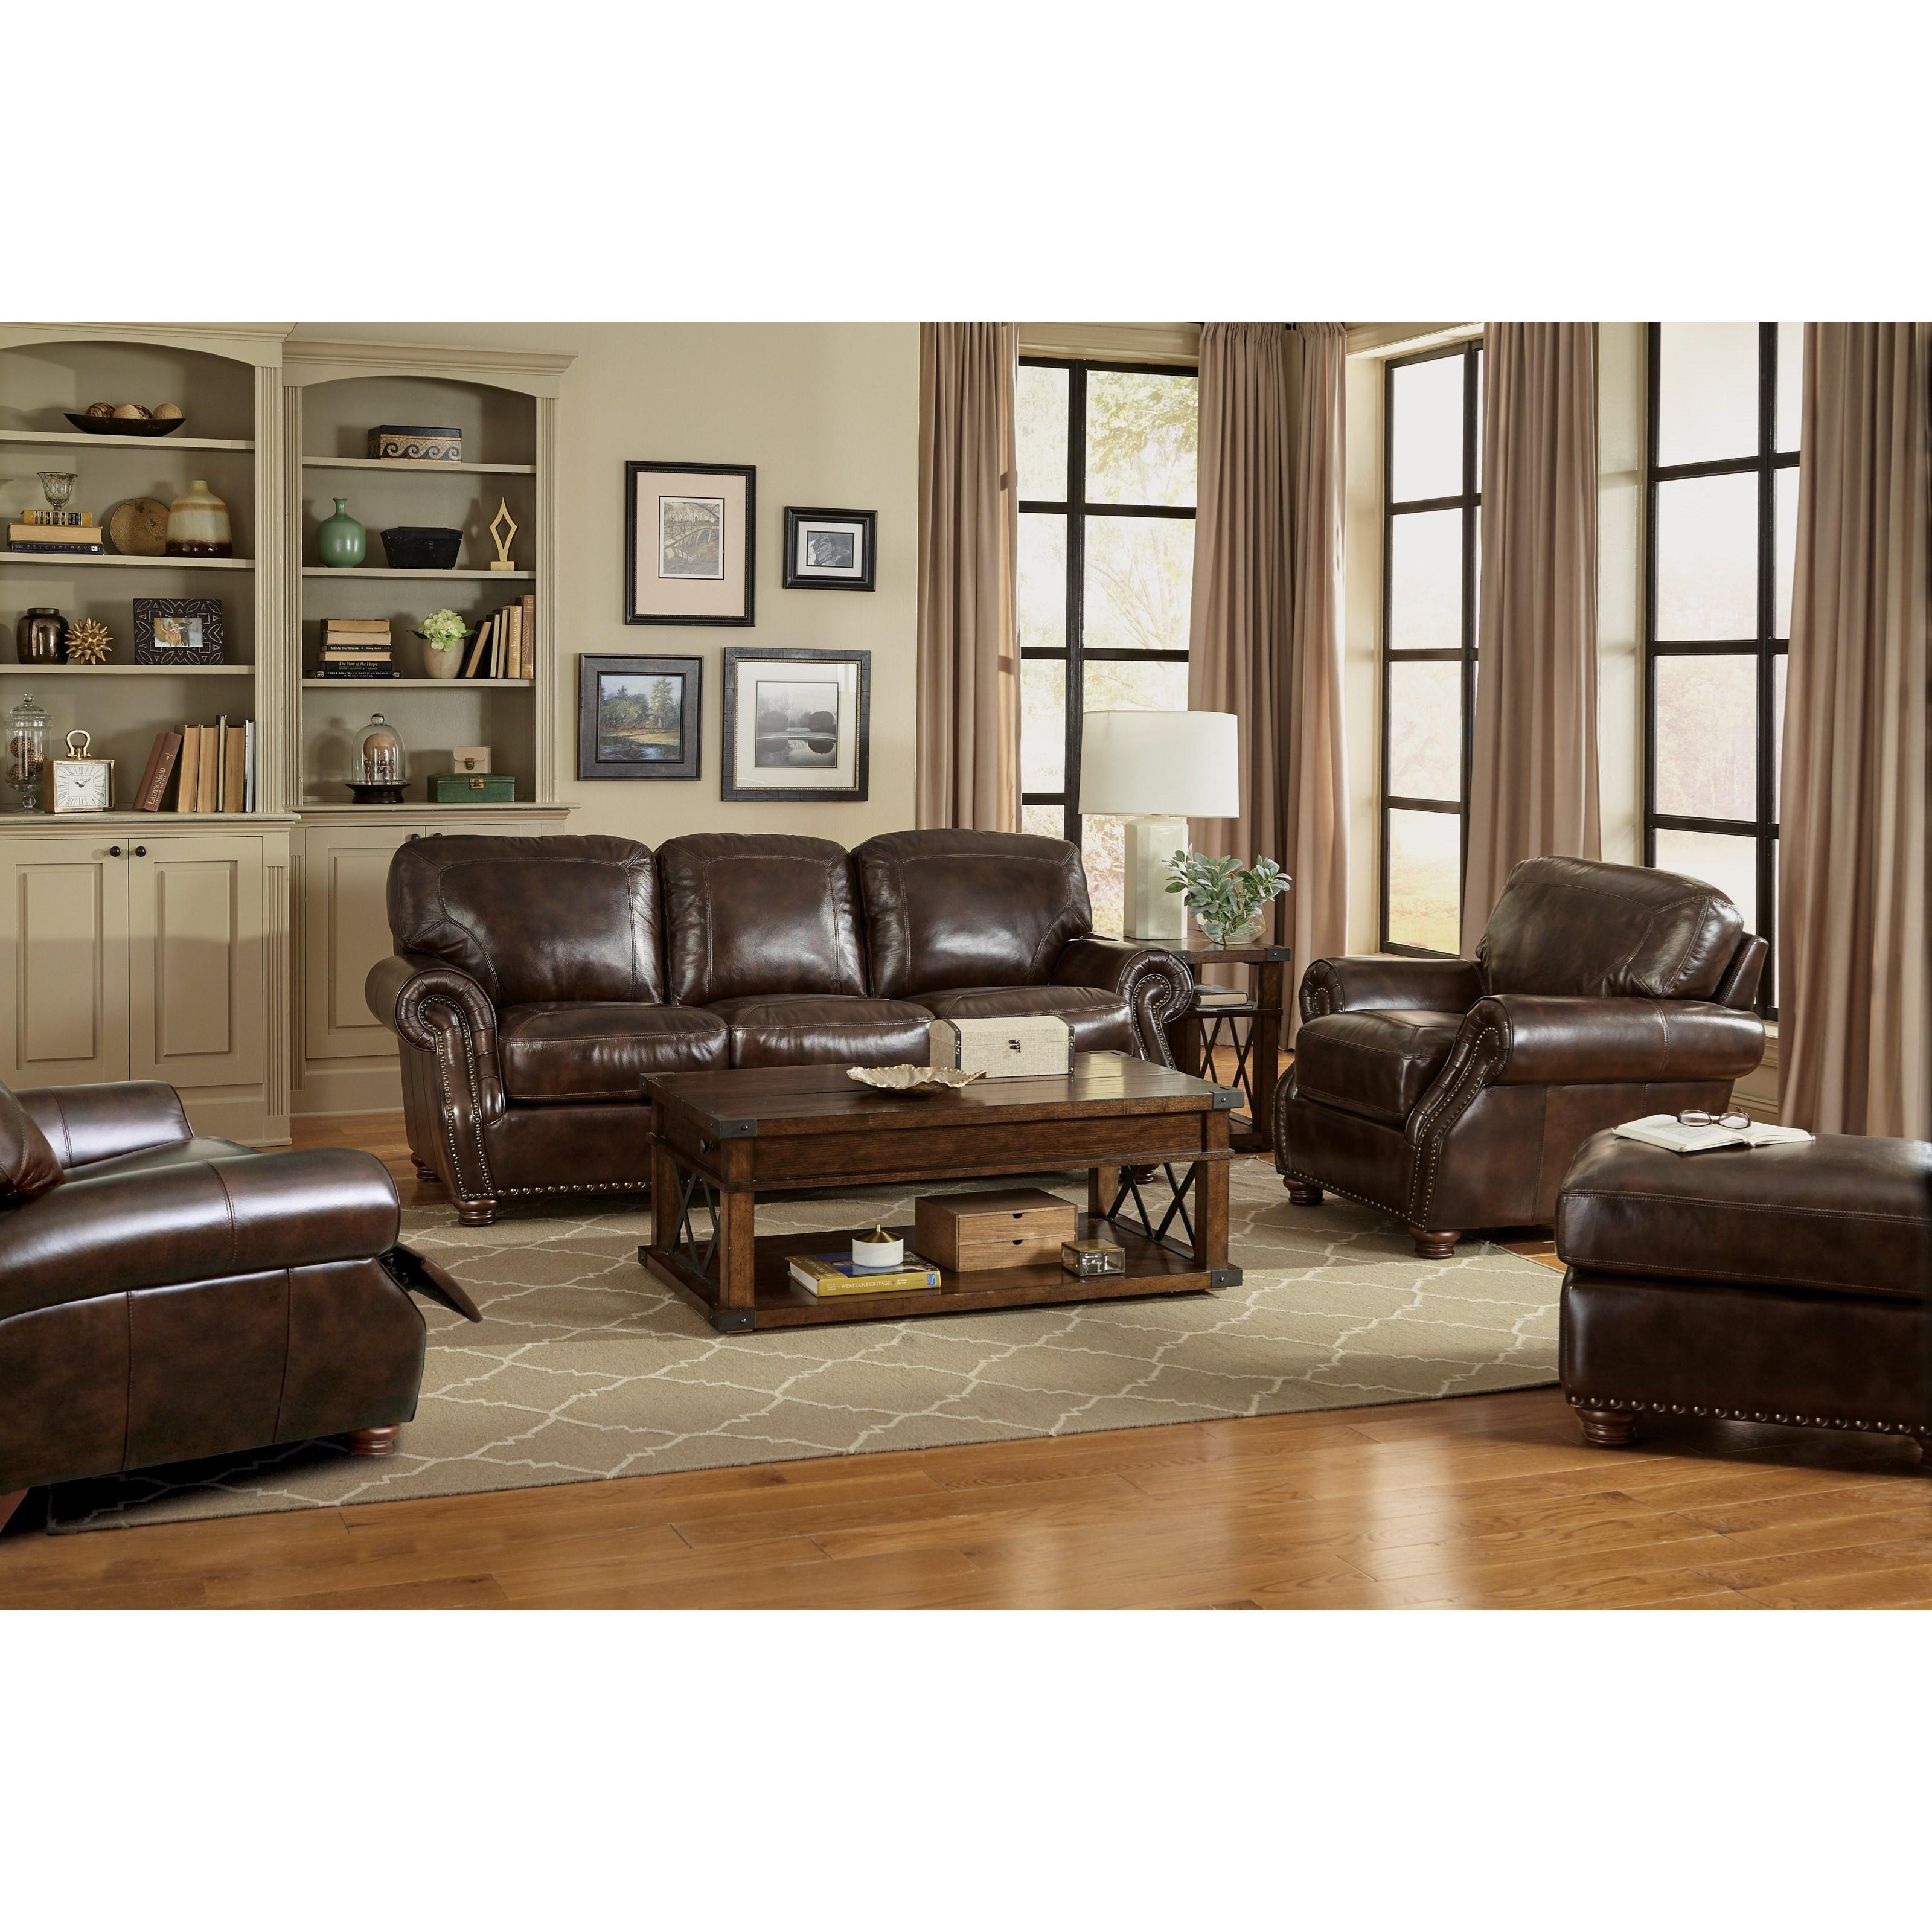 Craftmaster L1611 Traditional Living Room Group Jacksonville Furniture Mart Stationary